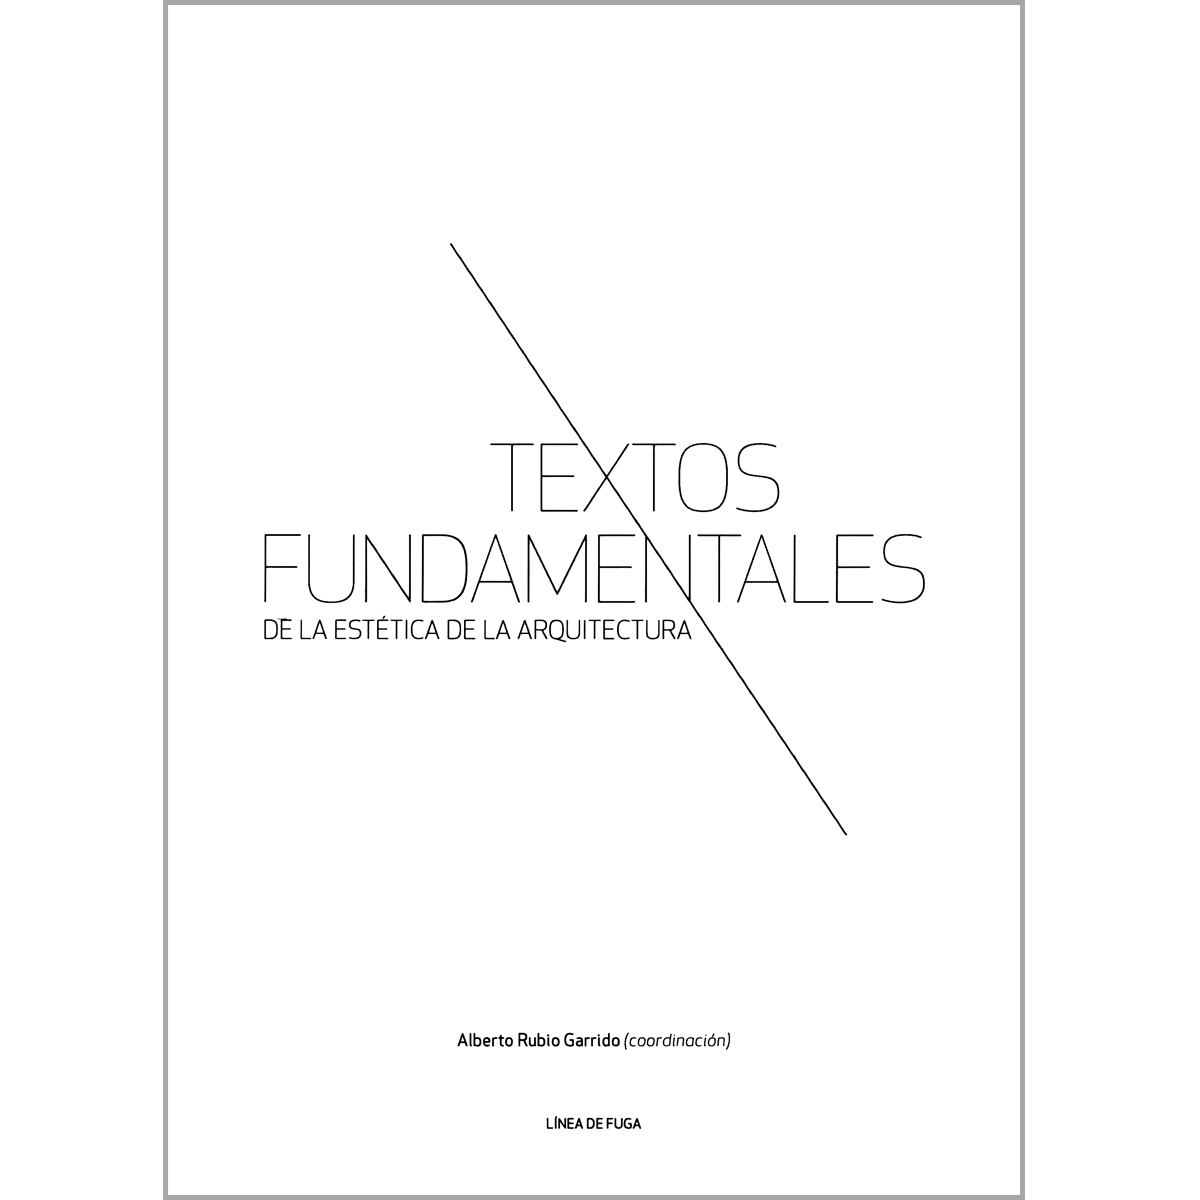 Textos fundamentales de la estética de la arquitectura